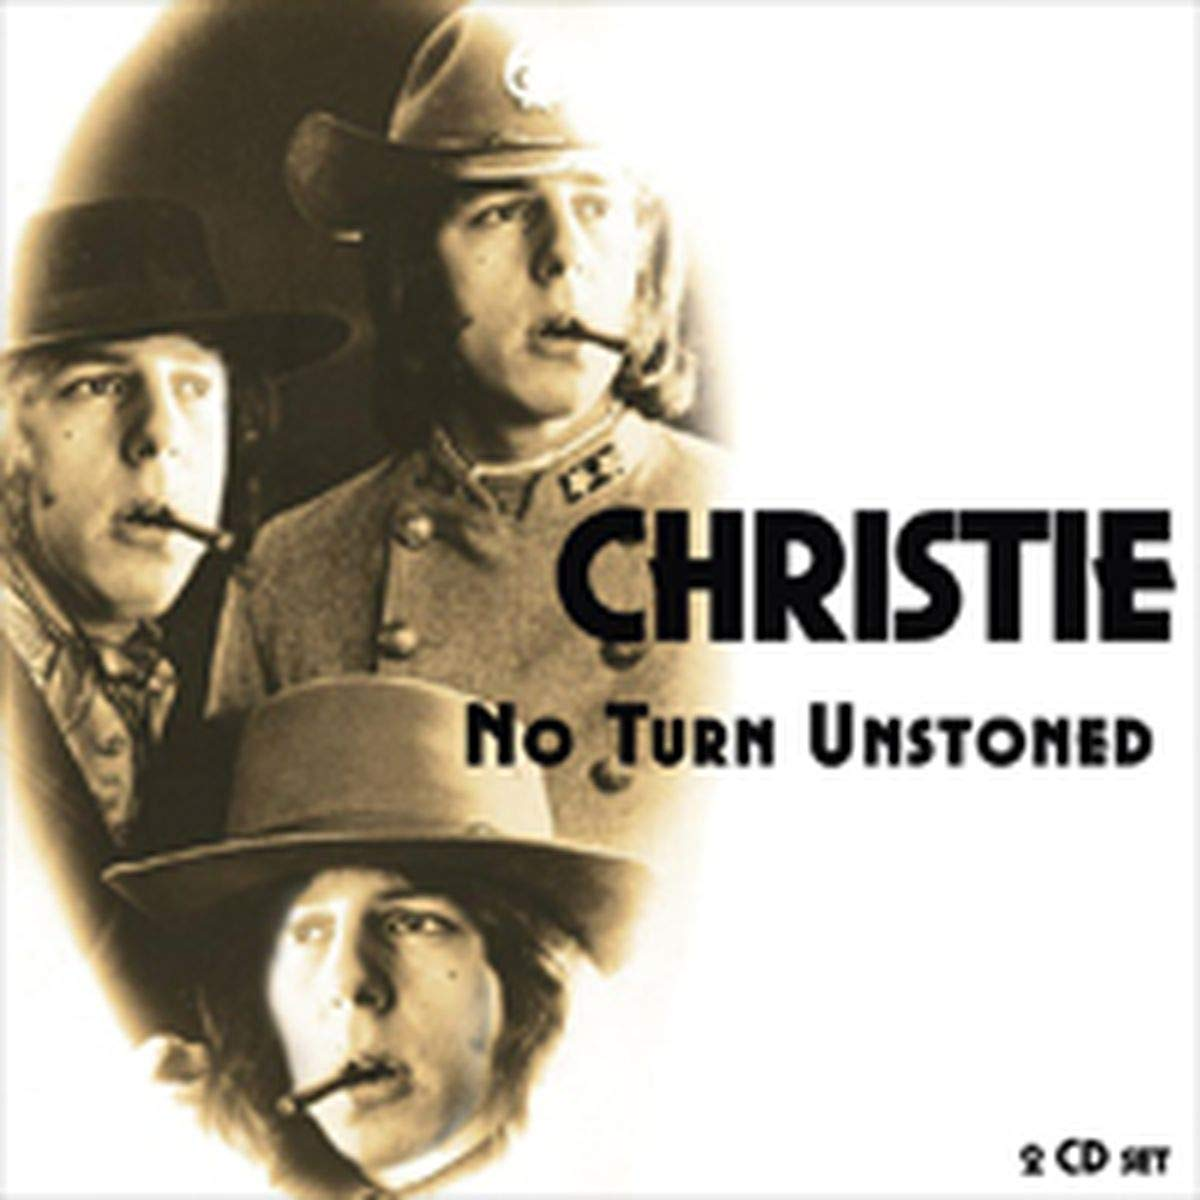 CD : Christie - No Turn Unstoned (united Kingdom - Impor...